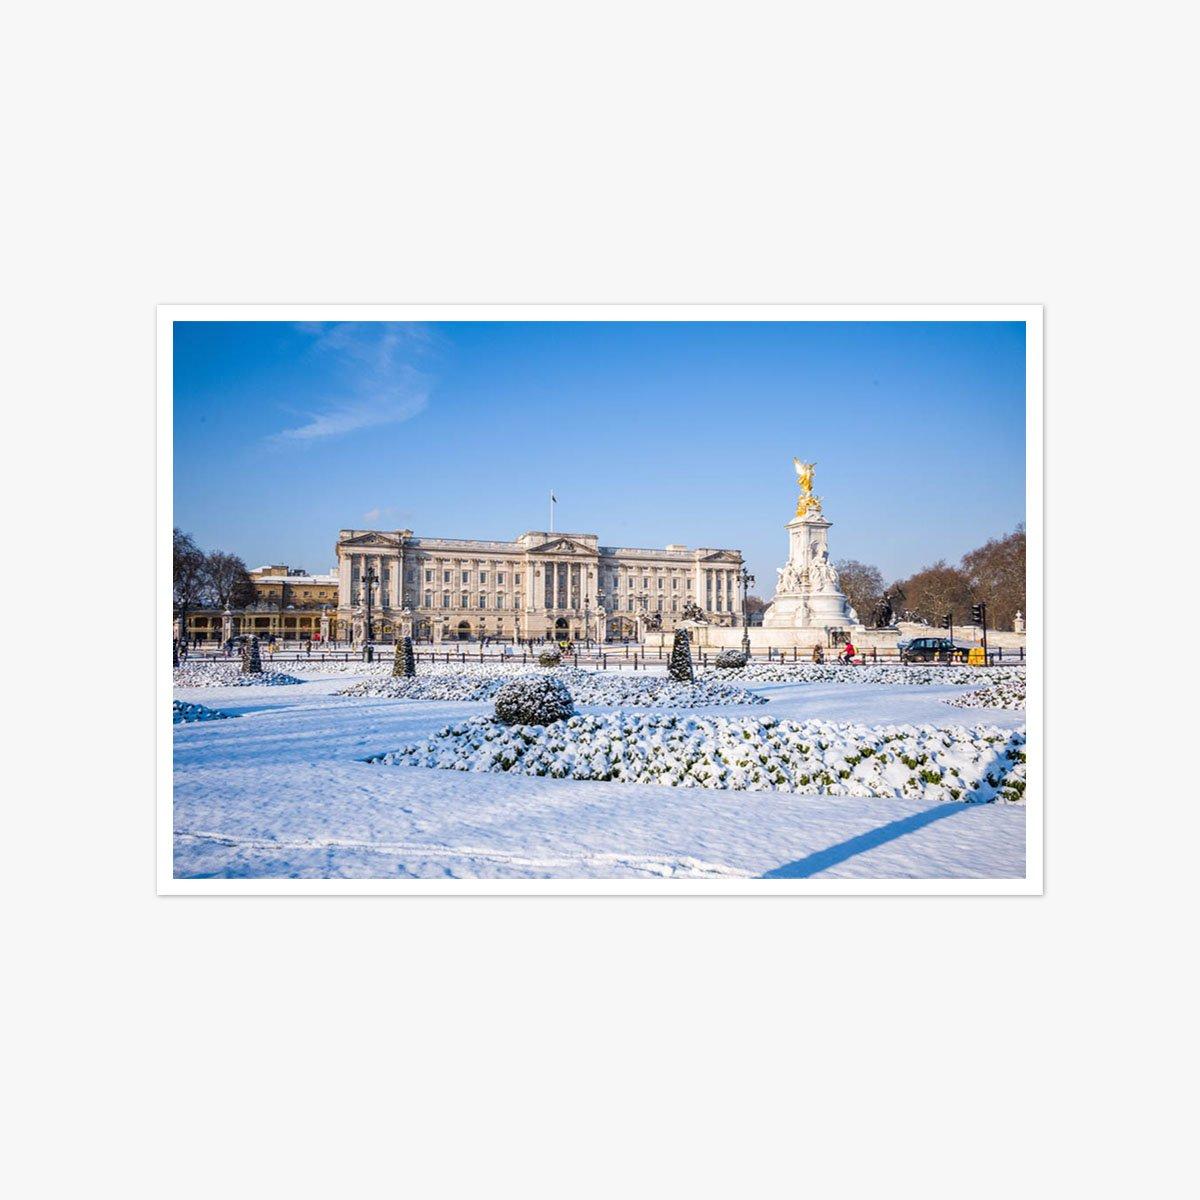 Snow At Buckingham Palace by Alex Lentati